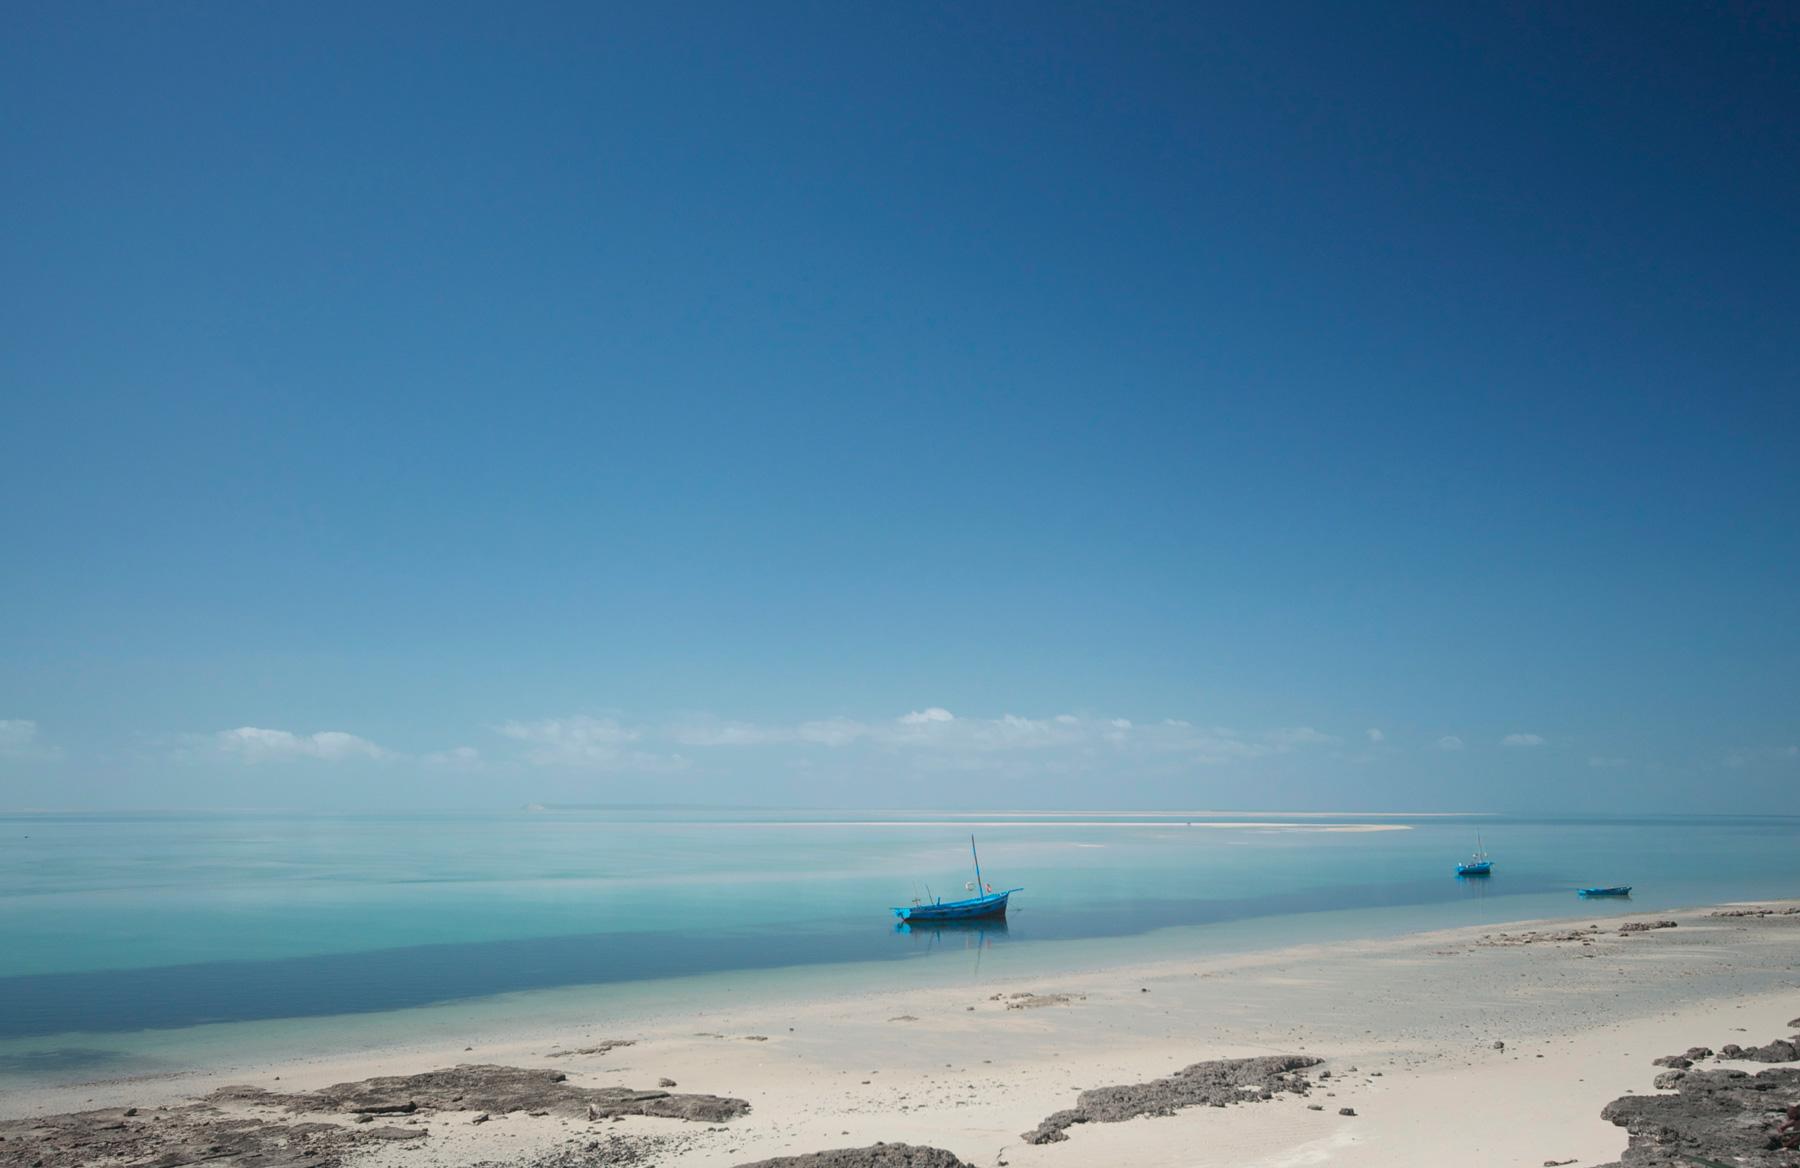 Africna-adventure-jeff-tyser-kerryn-lee-maggs-Vilanculo_Beach